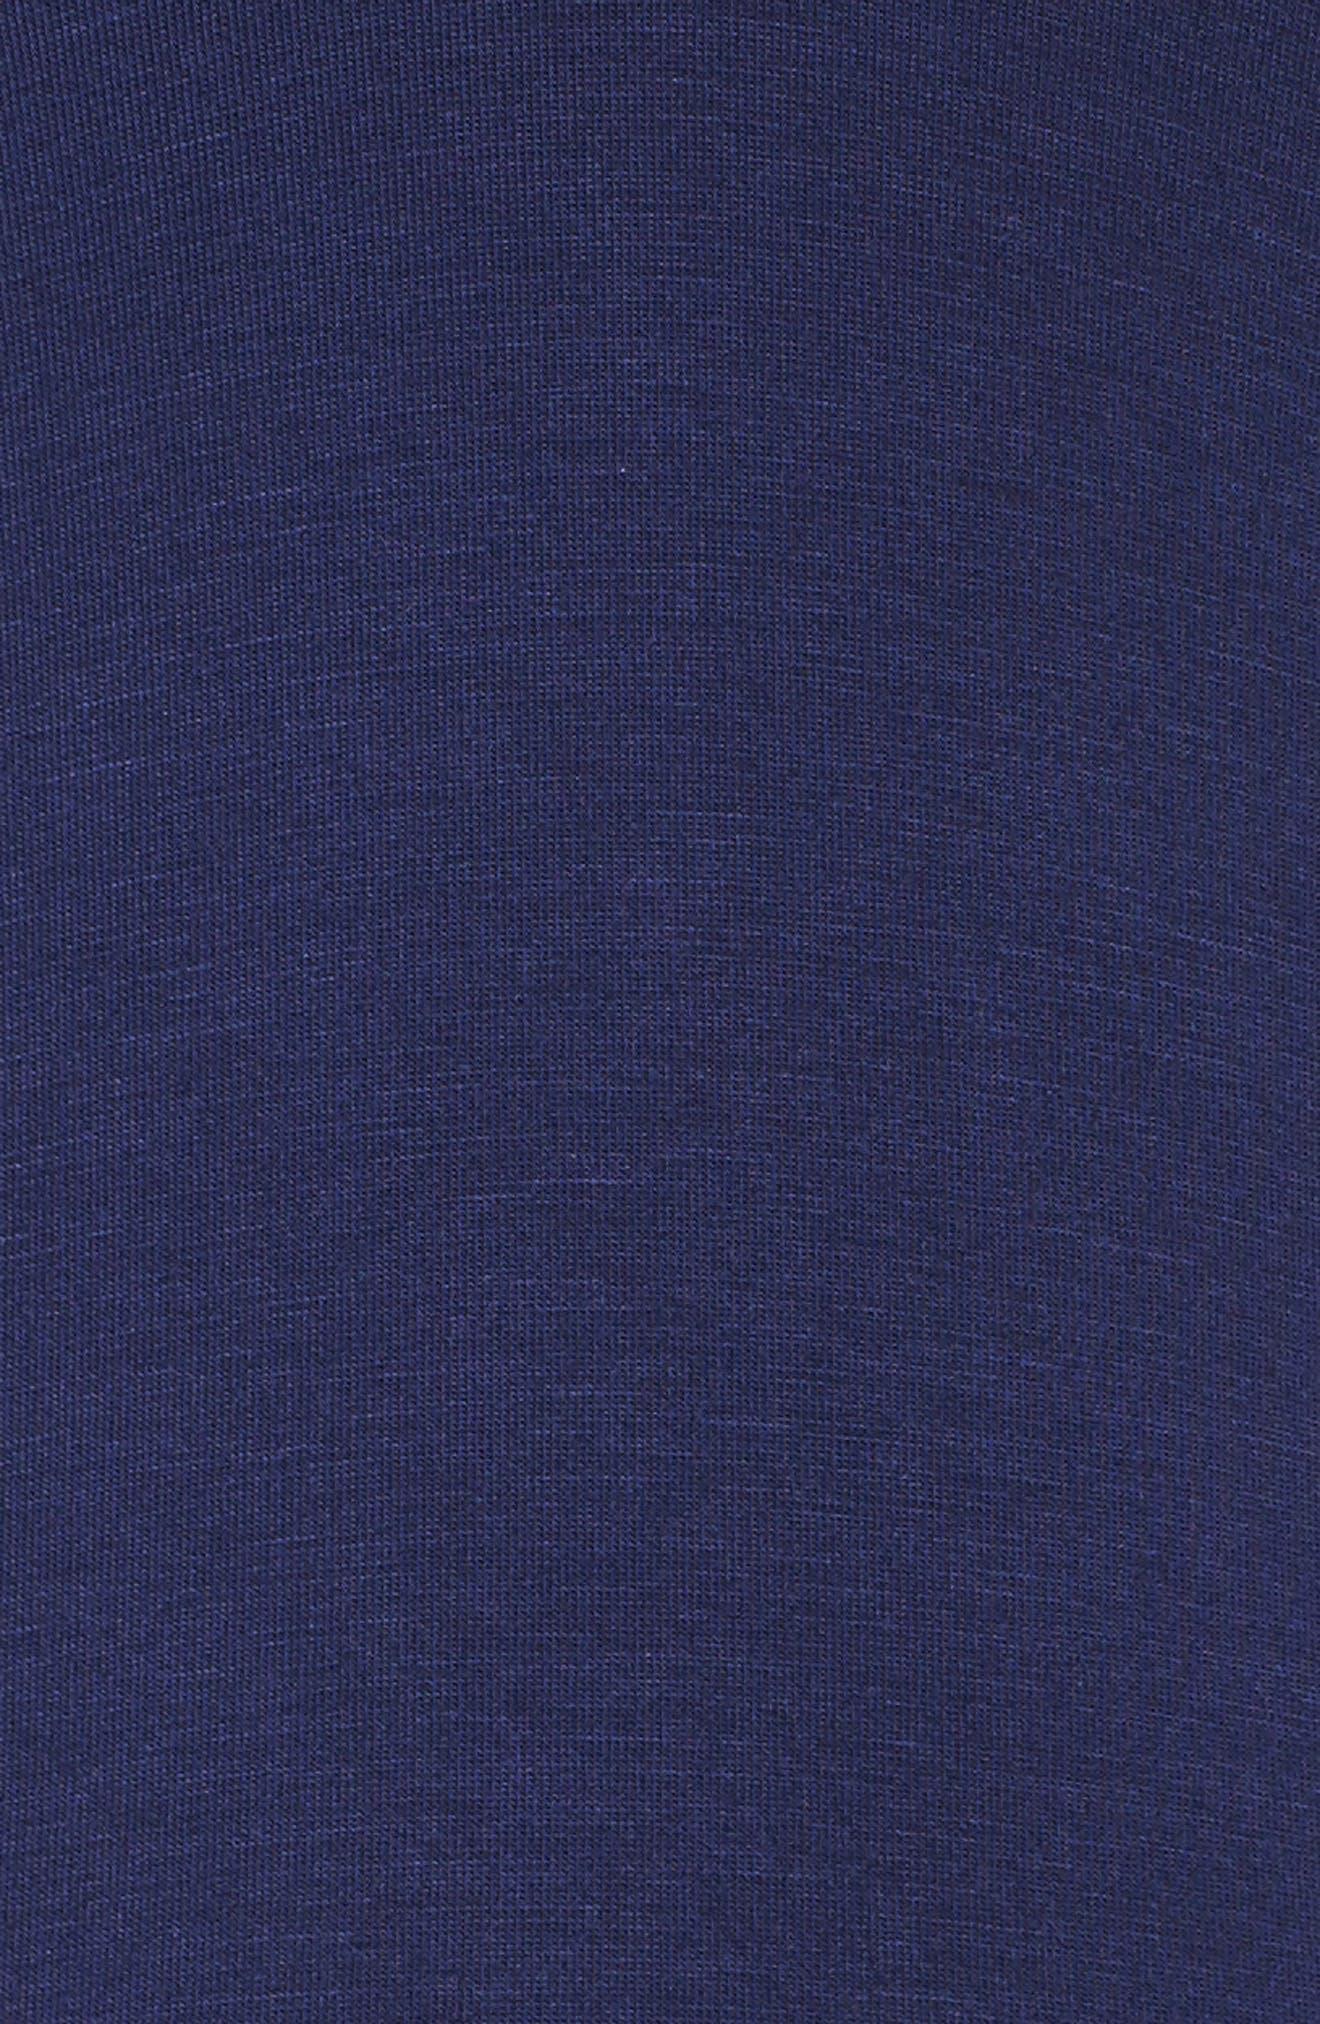 Cold Shoulder Maxi Dress,                             Alternate thumbnail 5, color,